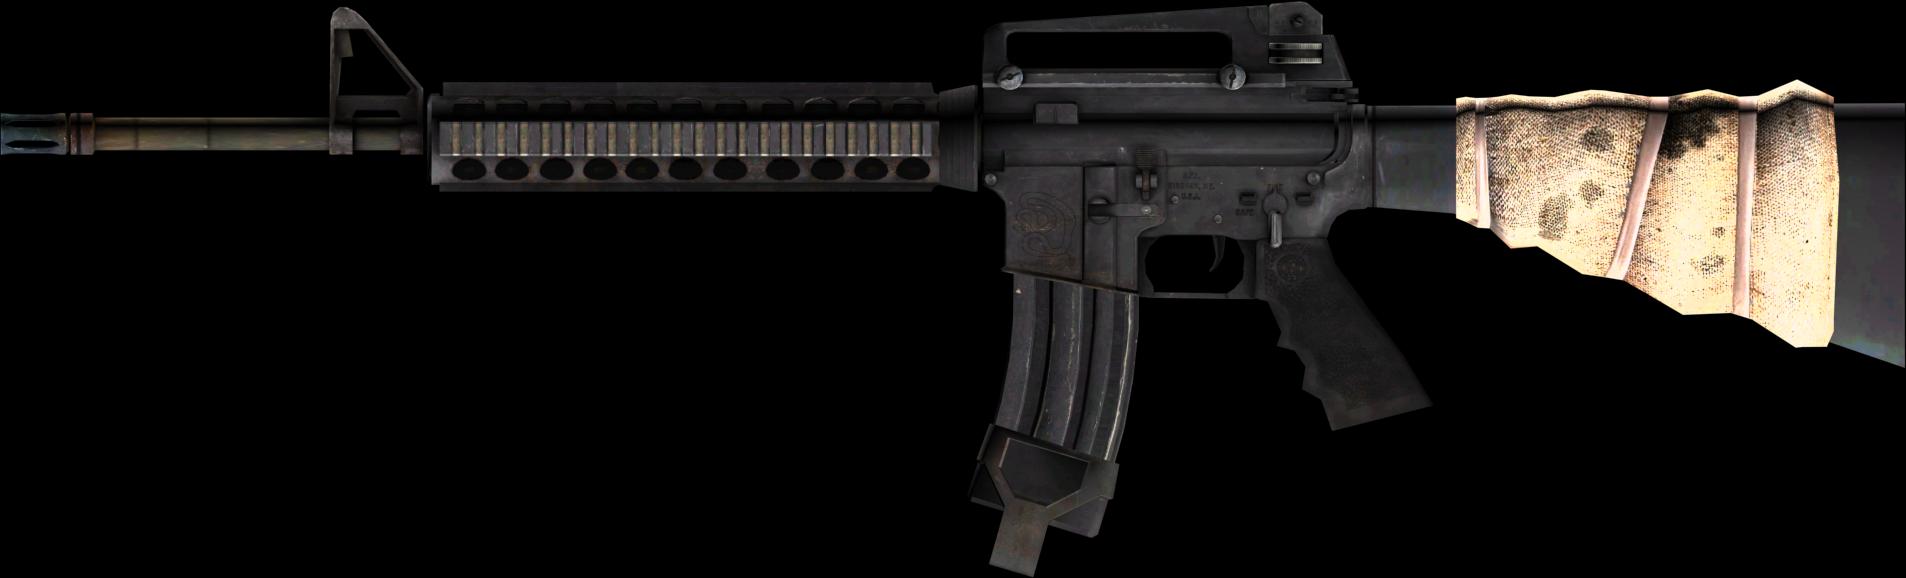 PNG HD Gun - 155063